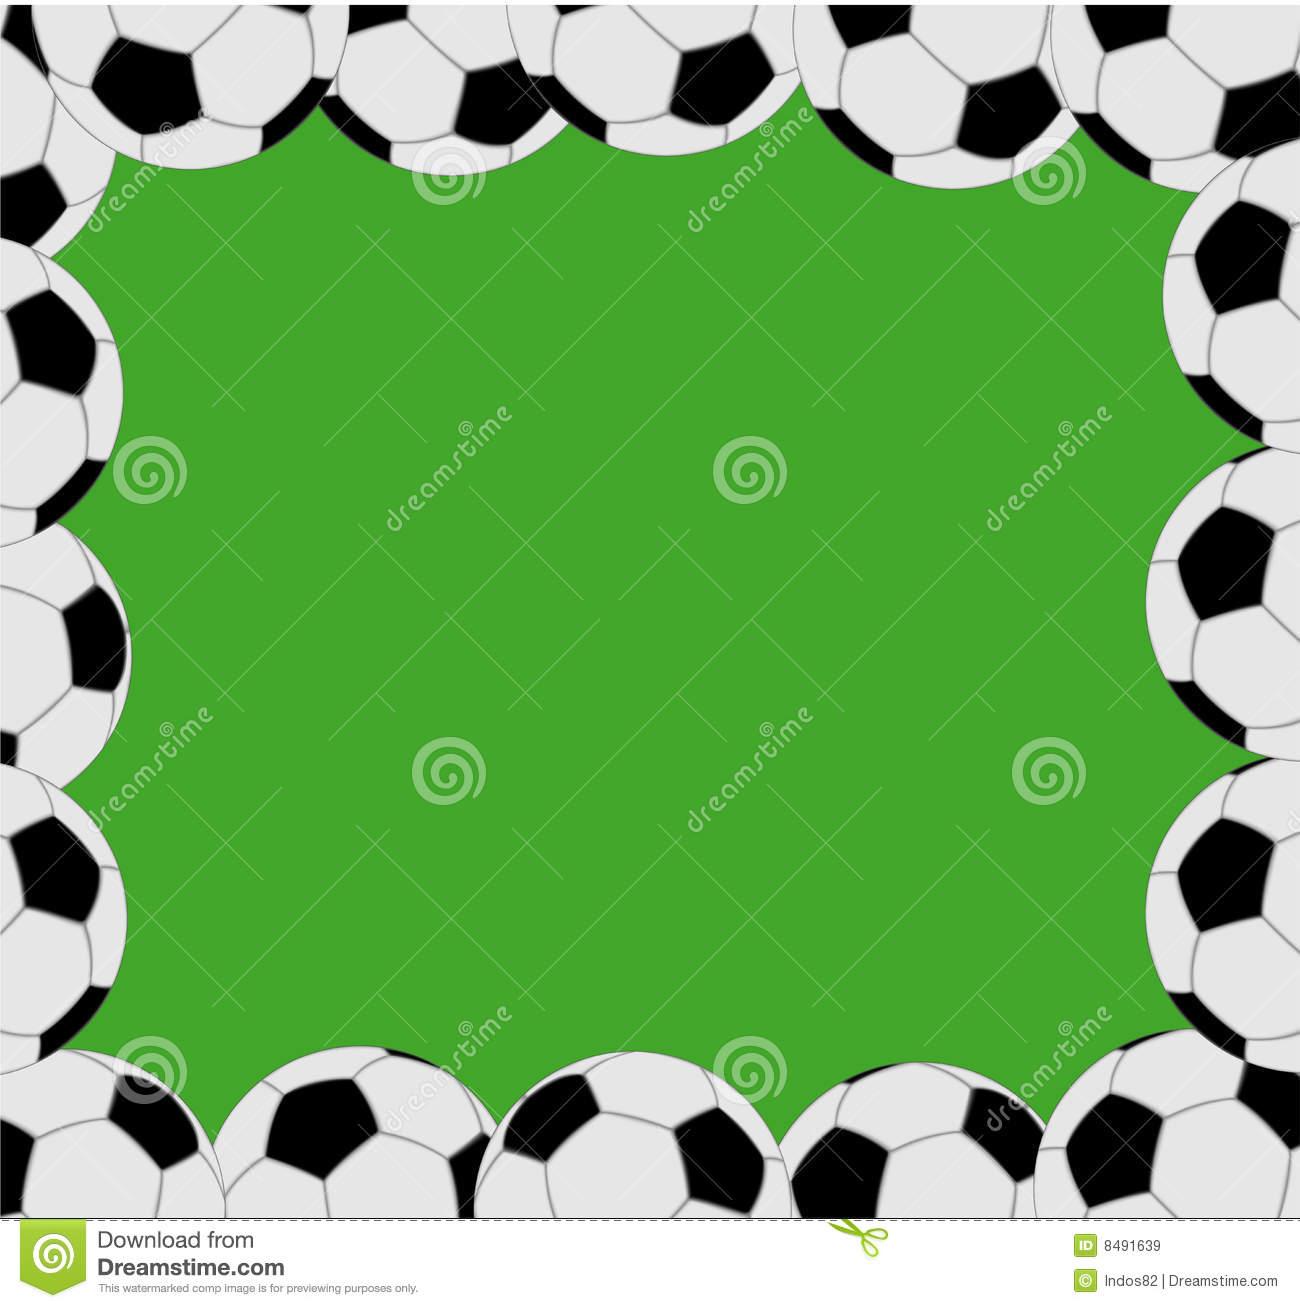 Soccer ball frame clipart clip transparent download Soccer Ball Frame Illustration 8491639 - Megapixl clip transparent download